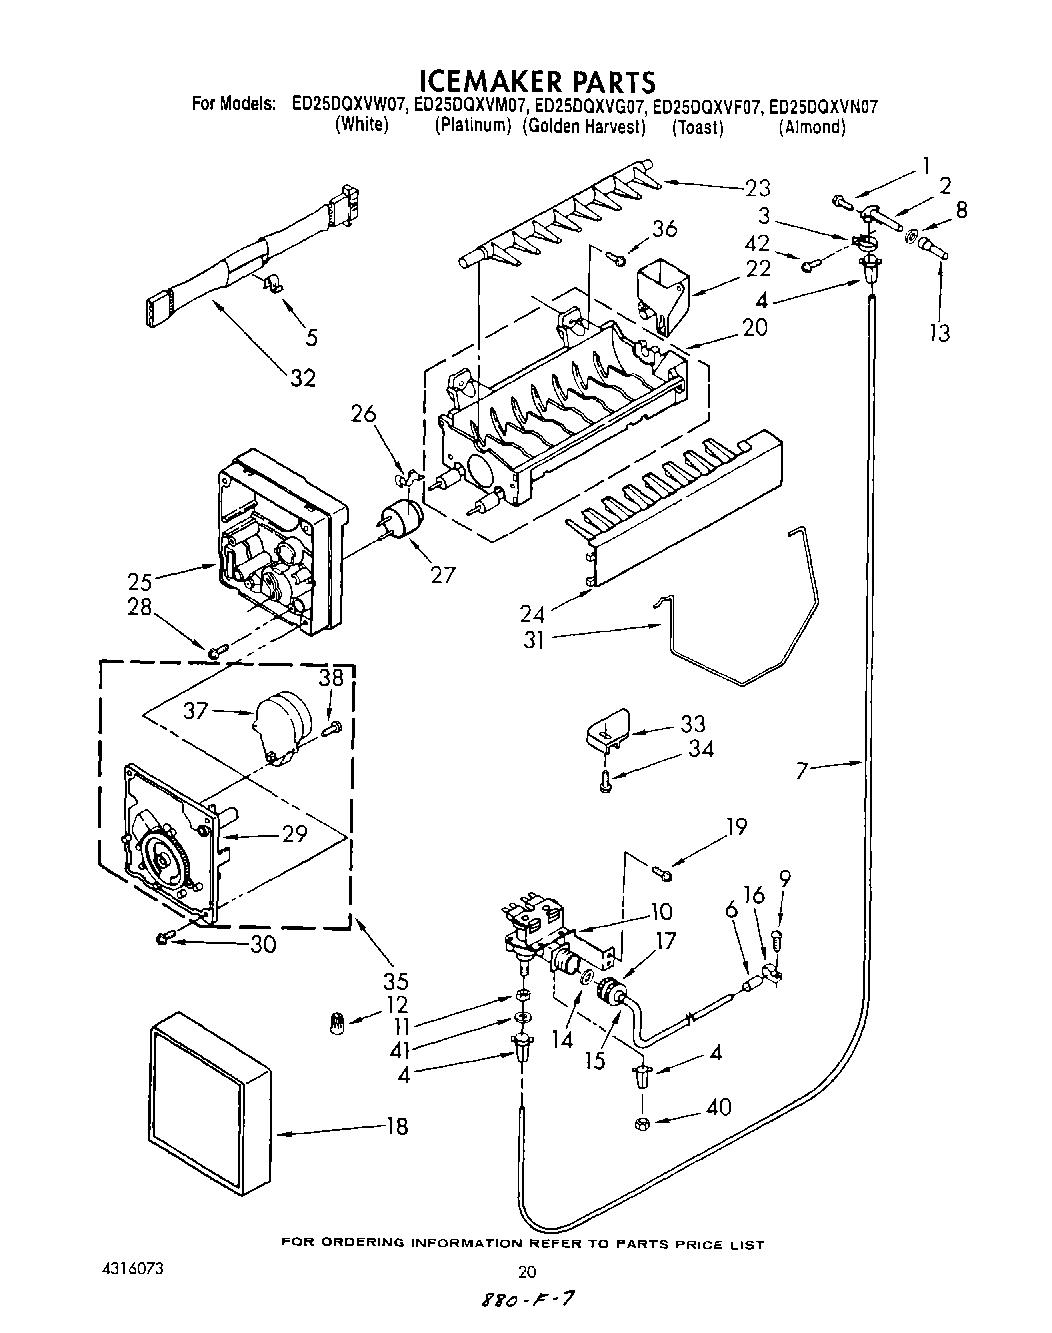 ED25DQXVF07